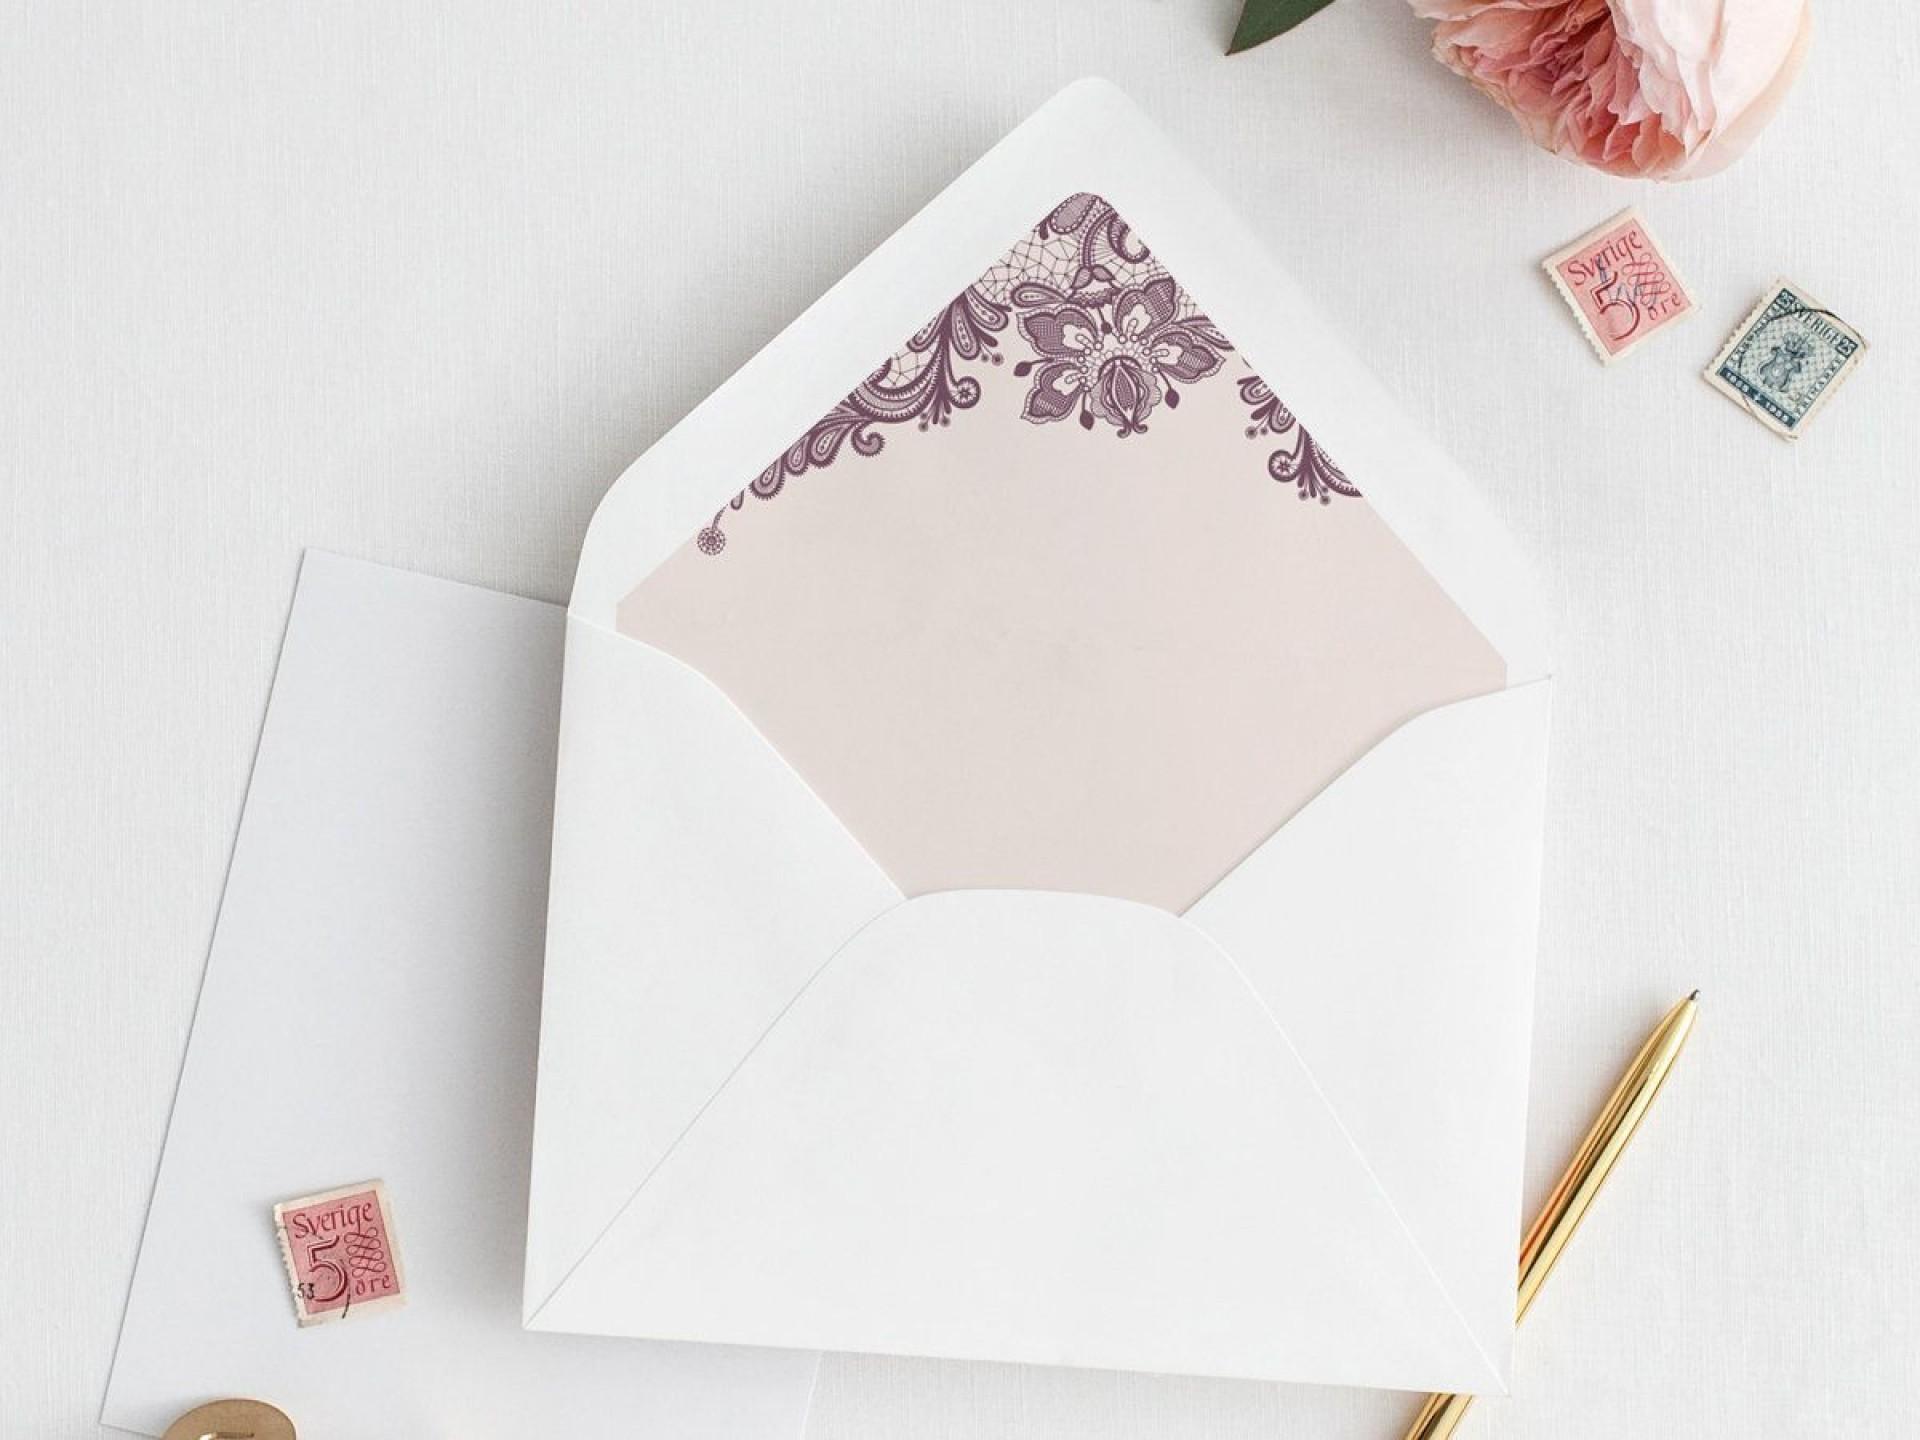 005 Dreaded A7 Envelope Liner Template Concept  Printable Illustrator Free1920